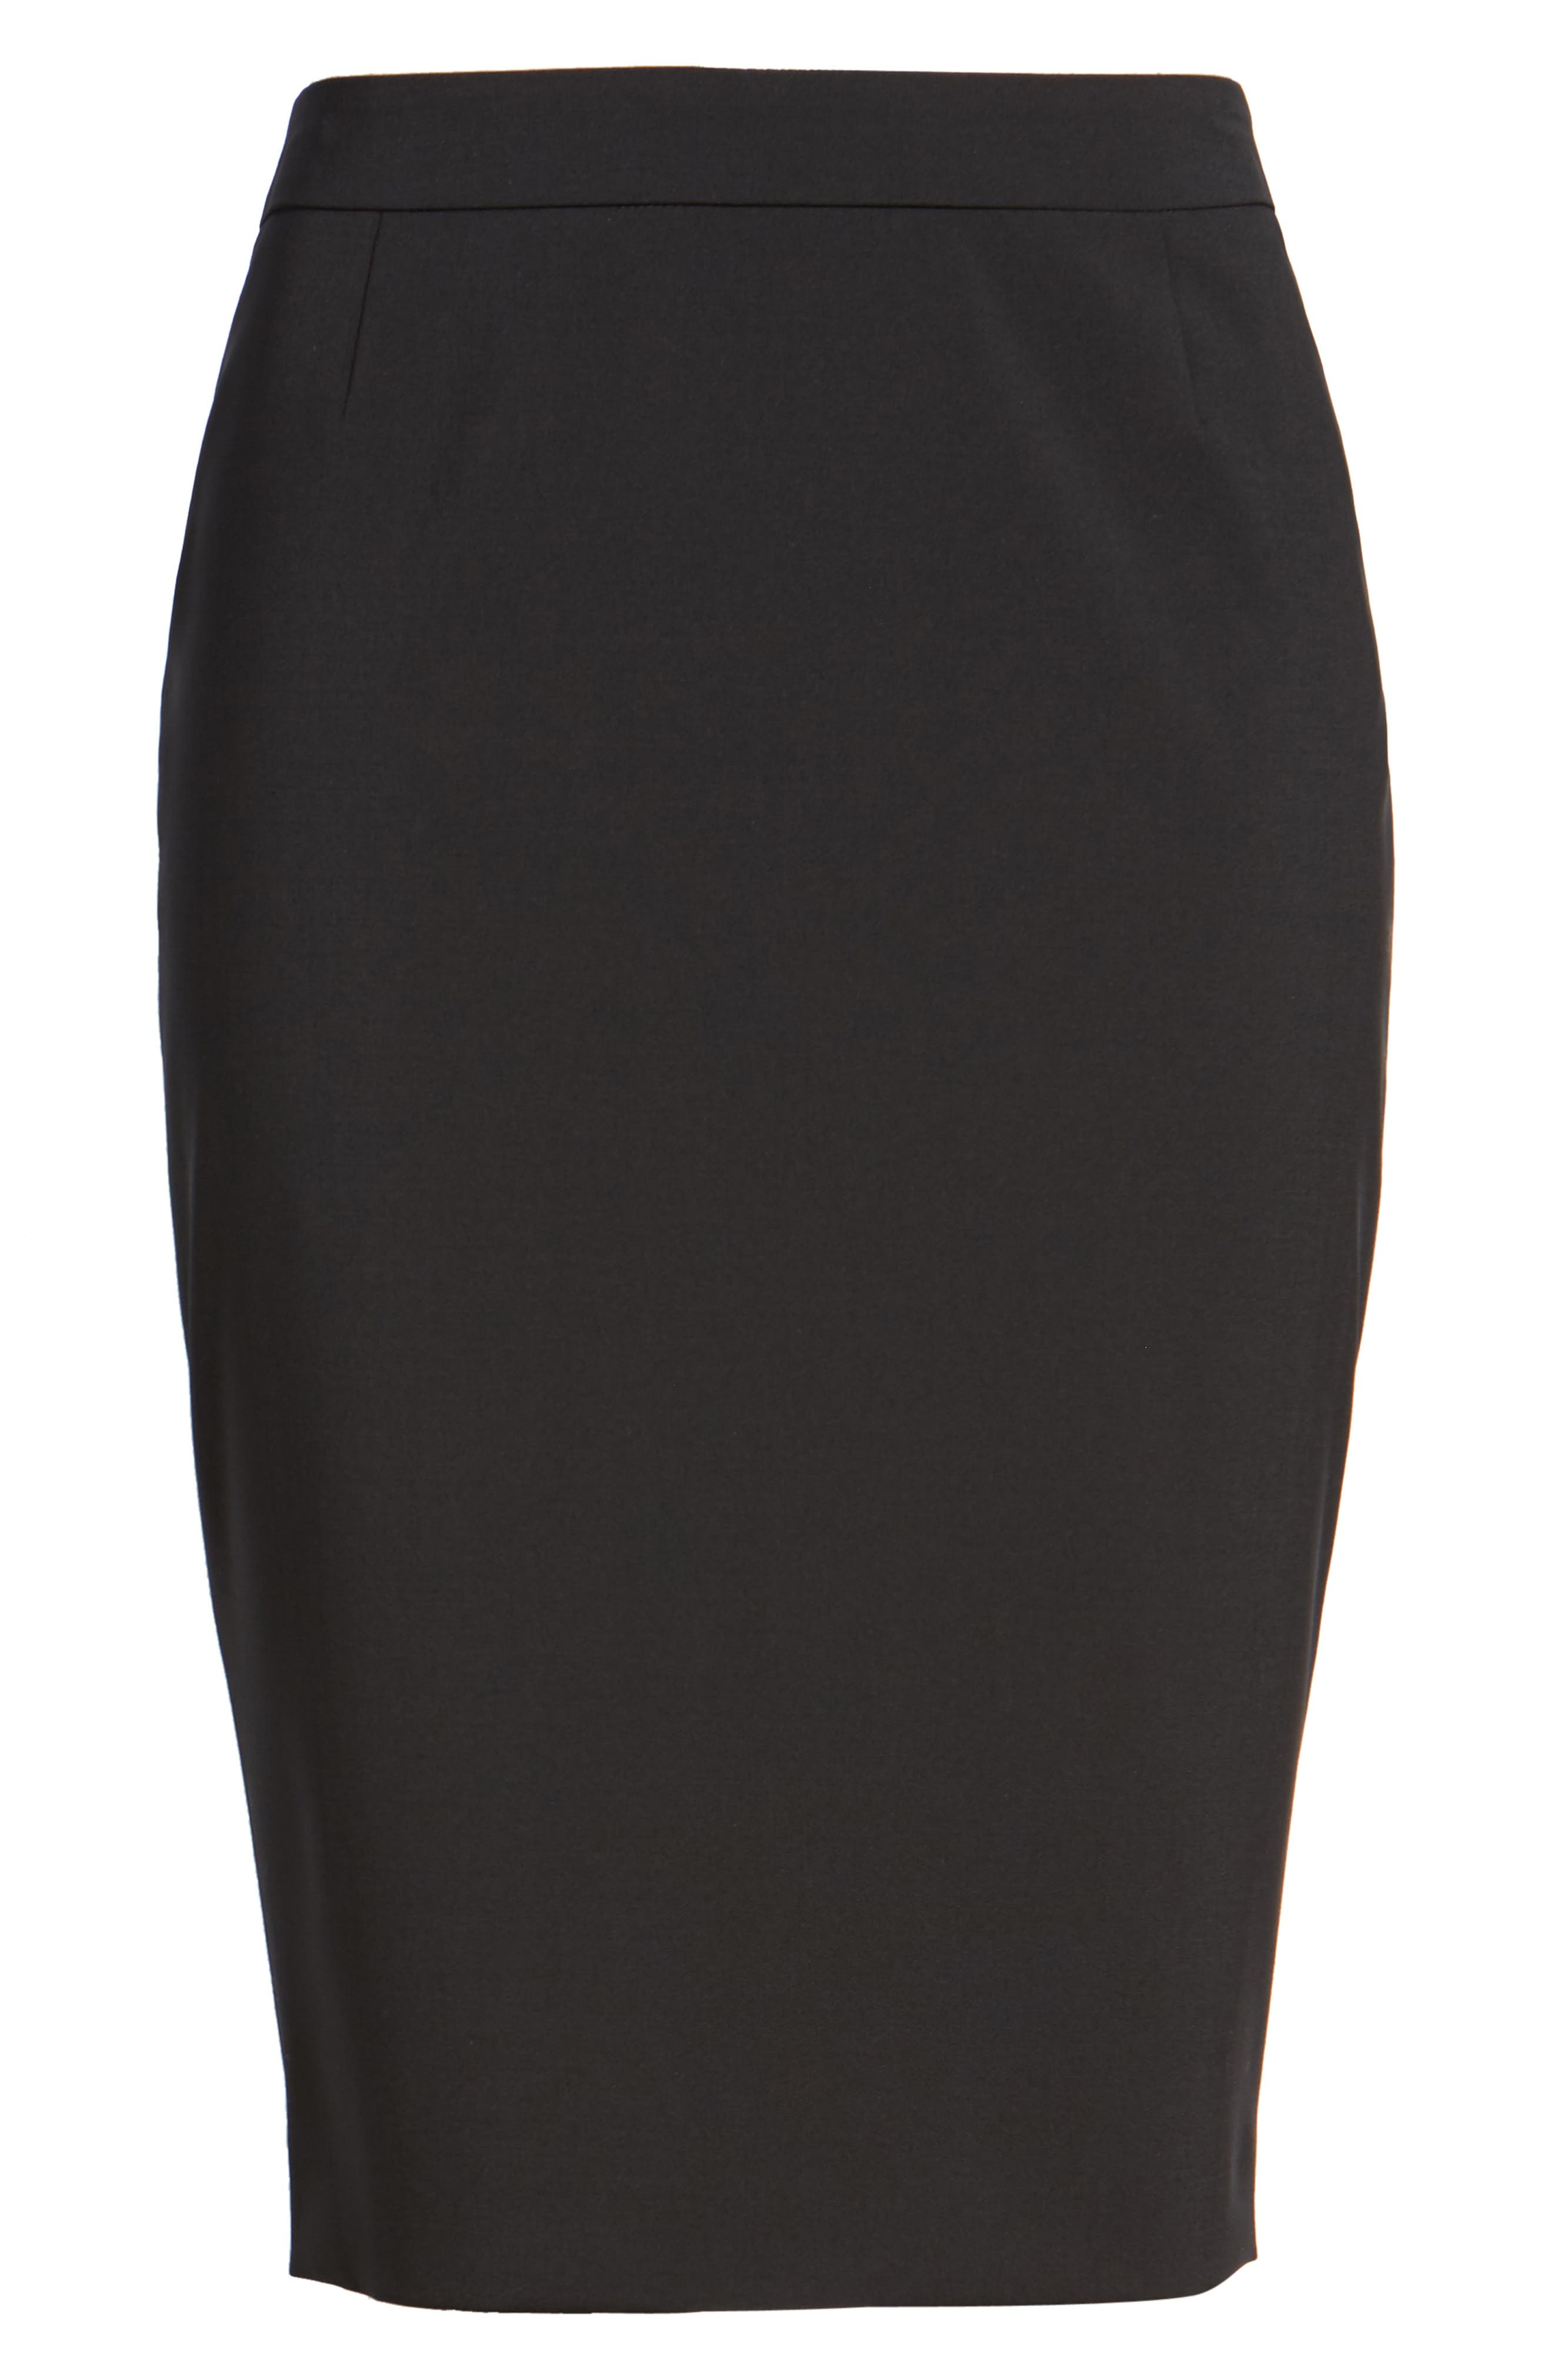 Vilea Tropical Stretch Wool Pencil Skirt,                             Alternate thumbnail 7, color,